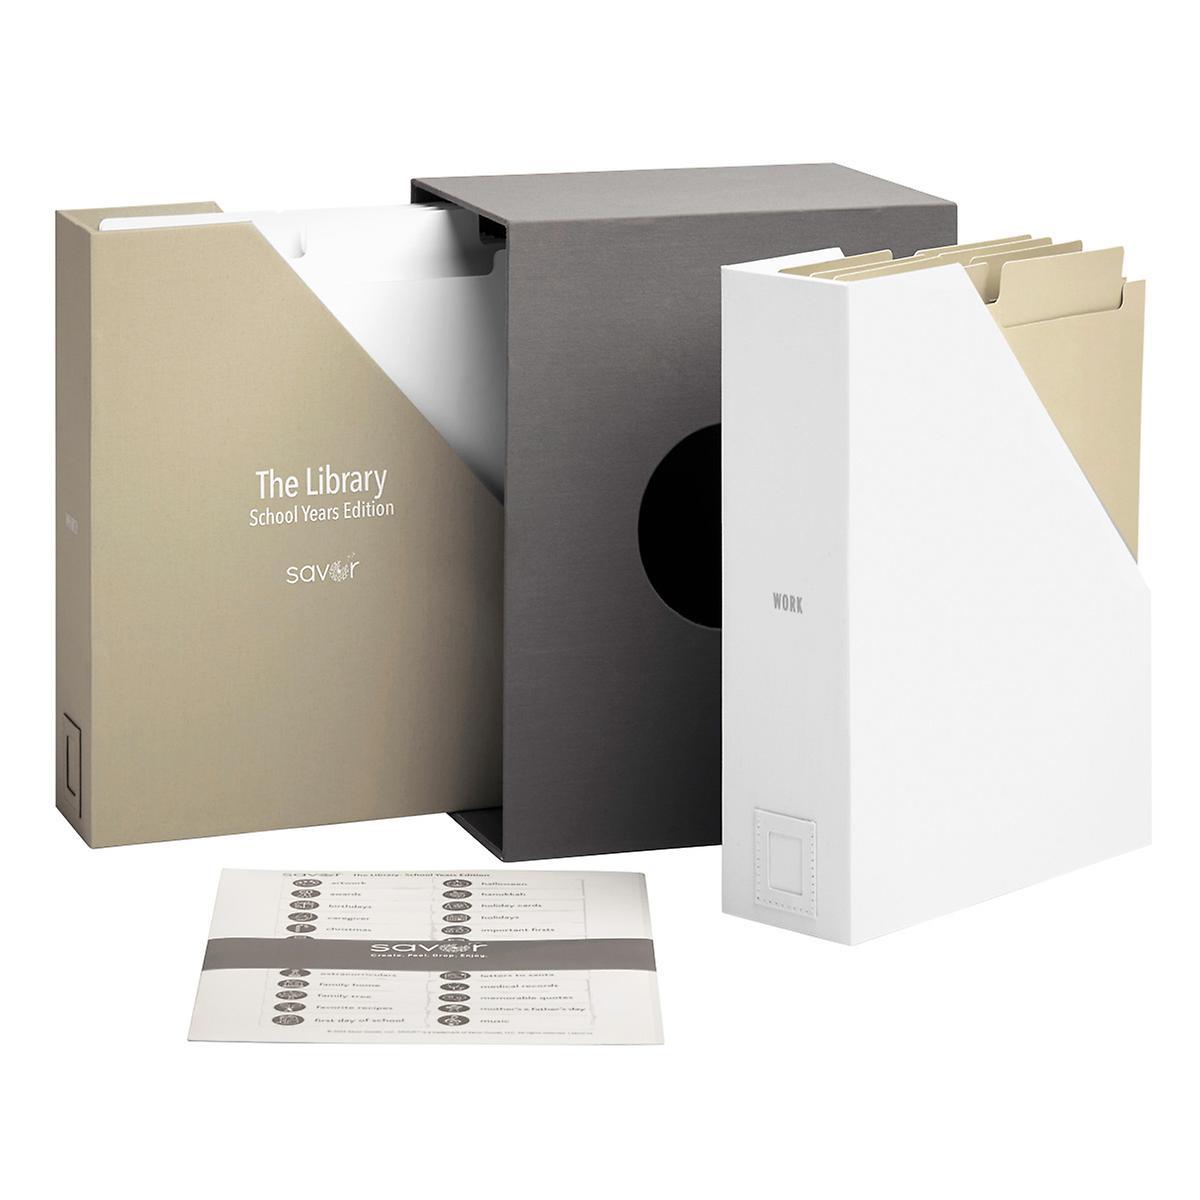 Savor School Years Edition Keepsake Box